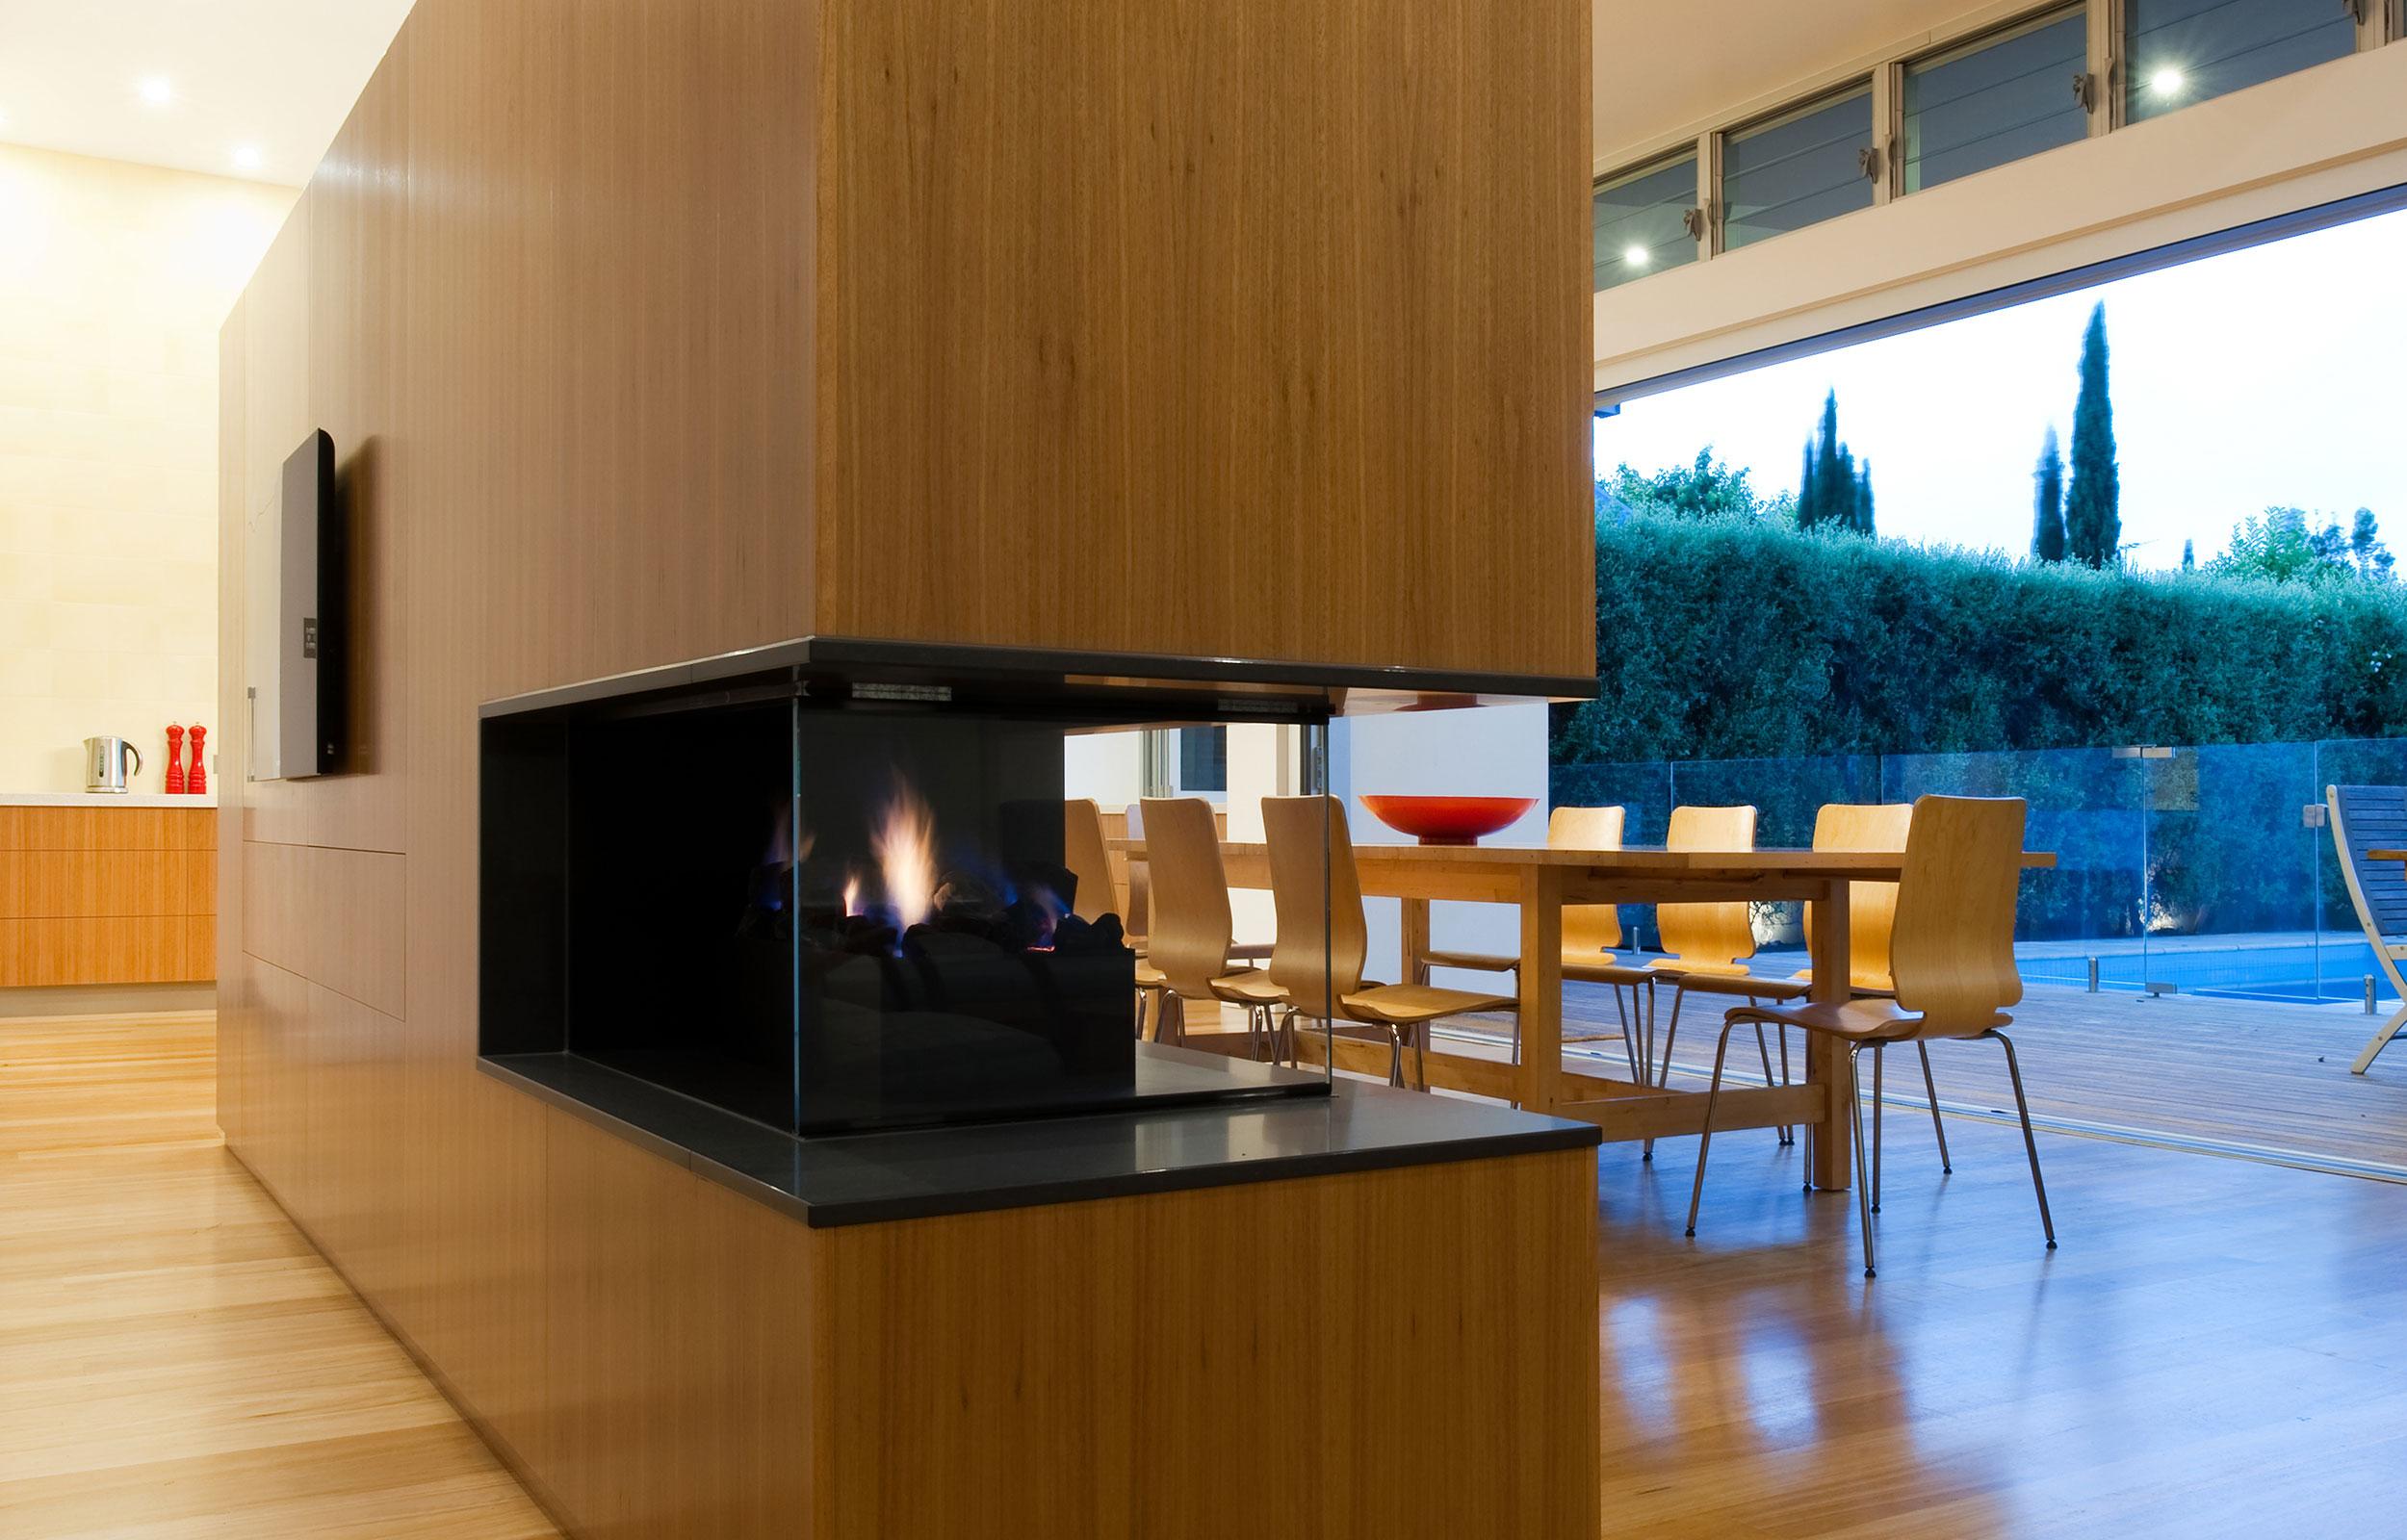 enoki-interior-Halbert-3.jpg